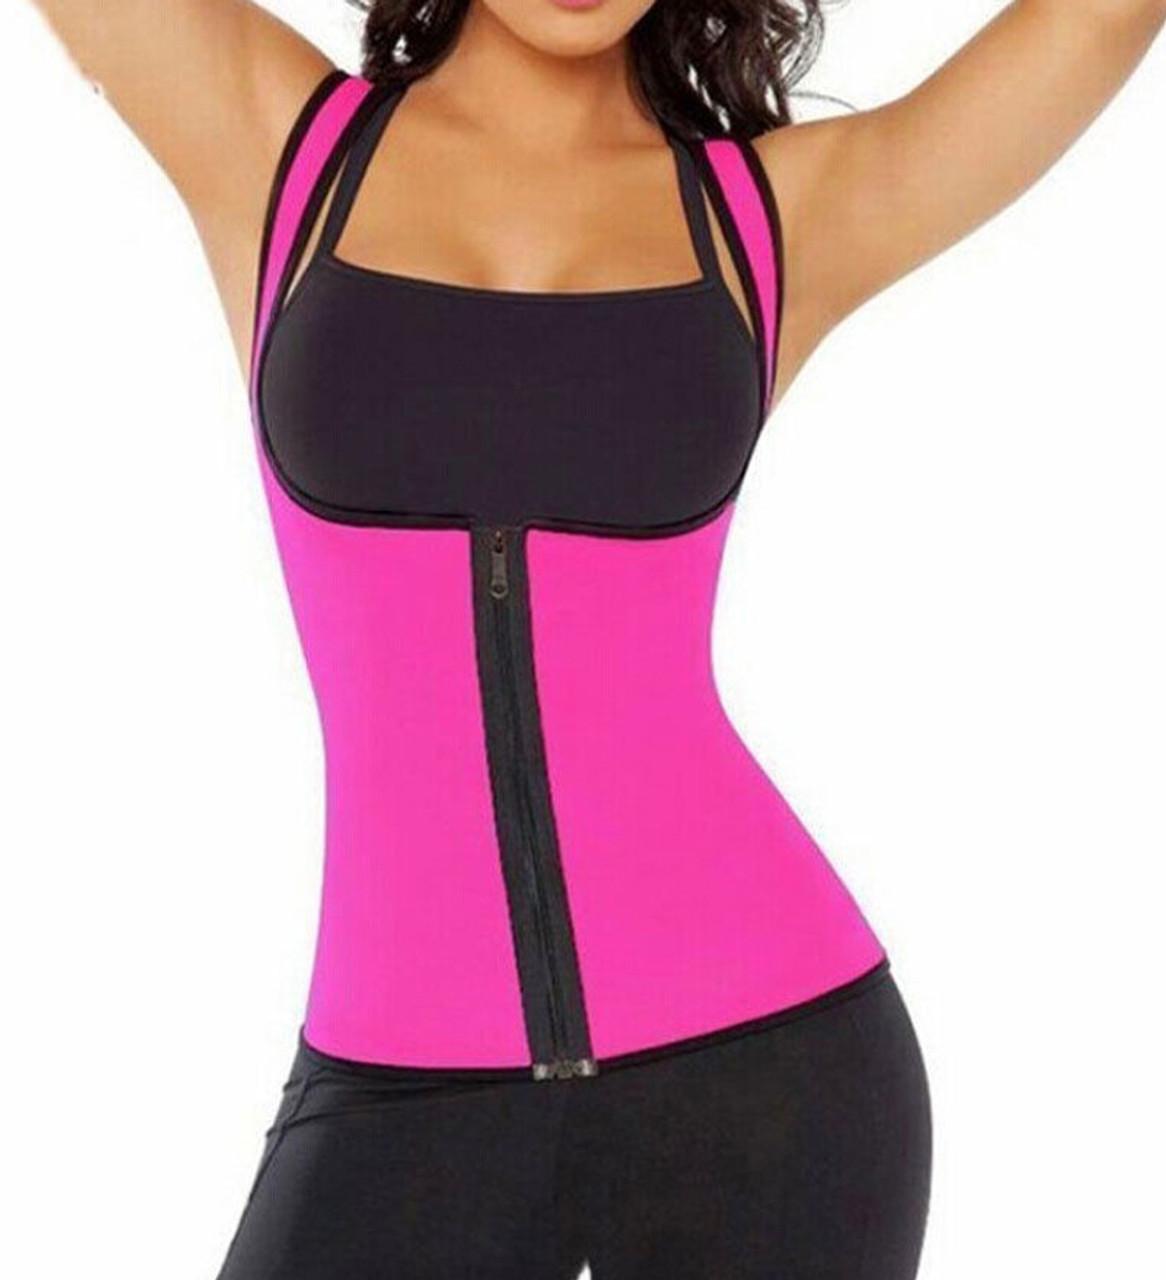 92bf9ba87b Hot Pink Waist Trainer Front Zipper for Women Neoprene Body Shaper for Gym  Workout Waist Training FREE Shipping. - www.kaneesha.com